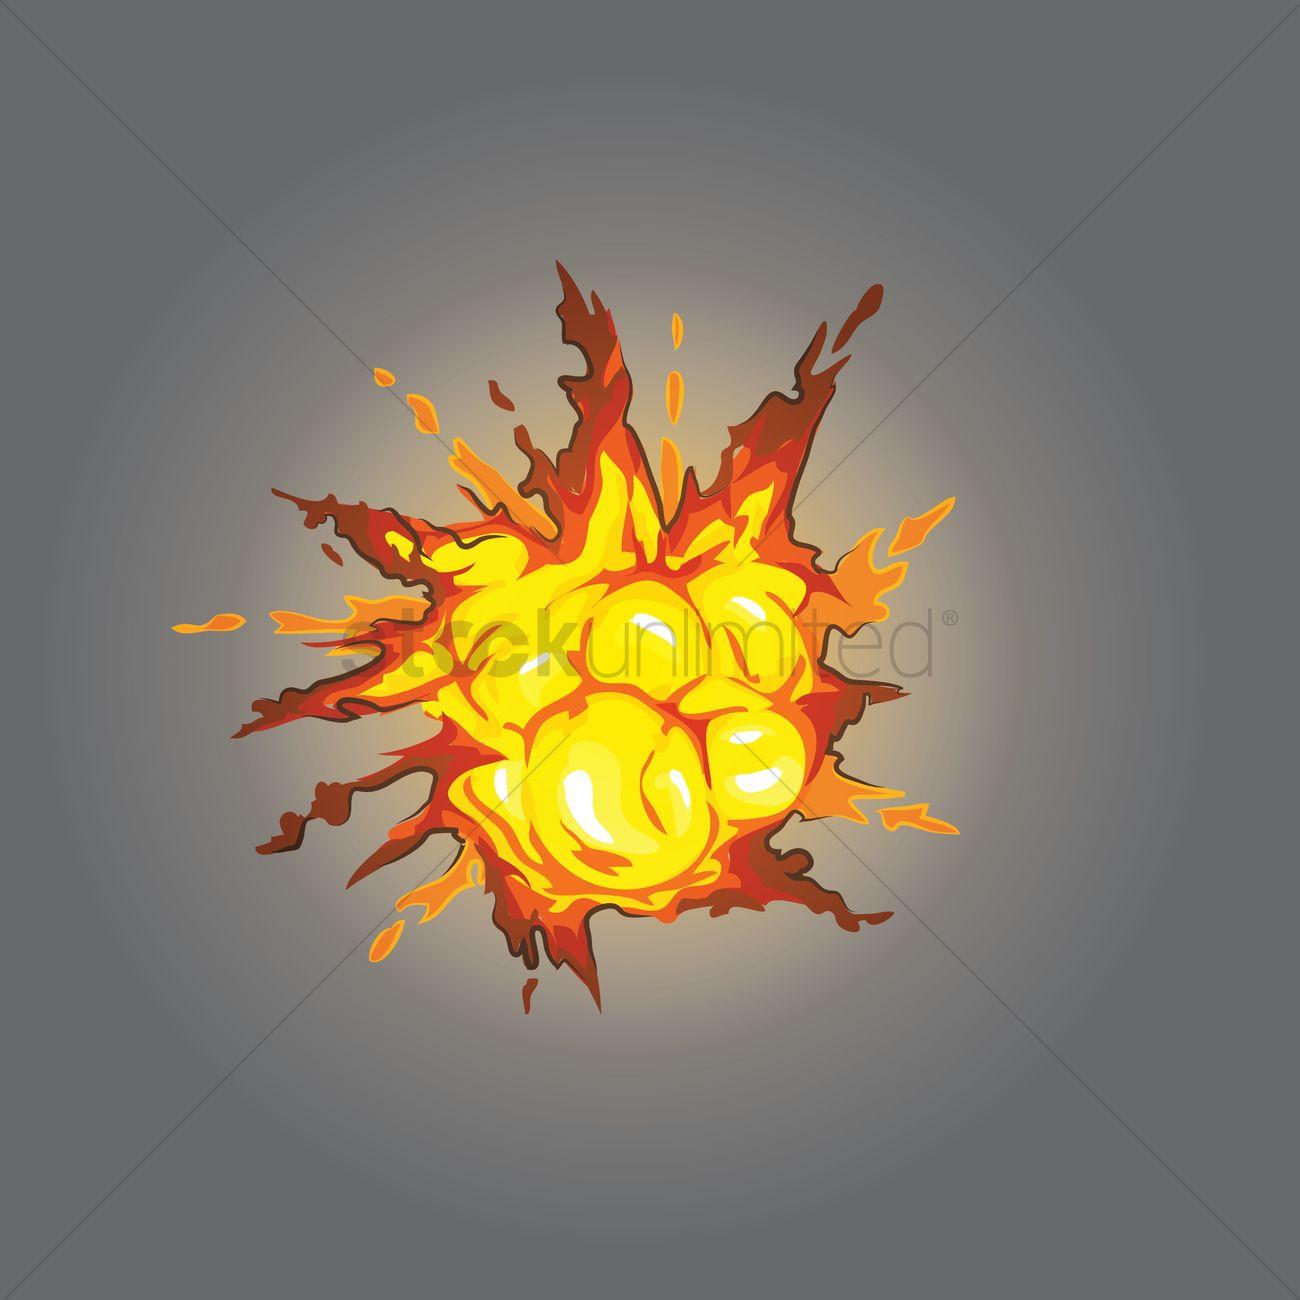 1300x1300 Isometric Explosion Vector Image